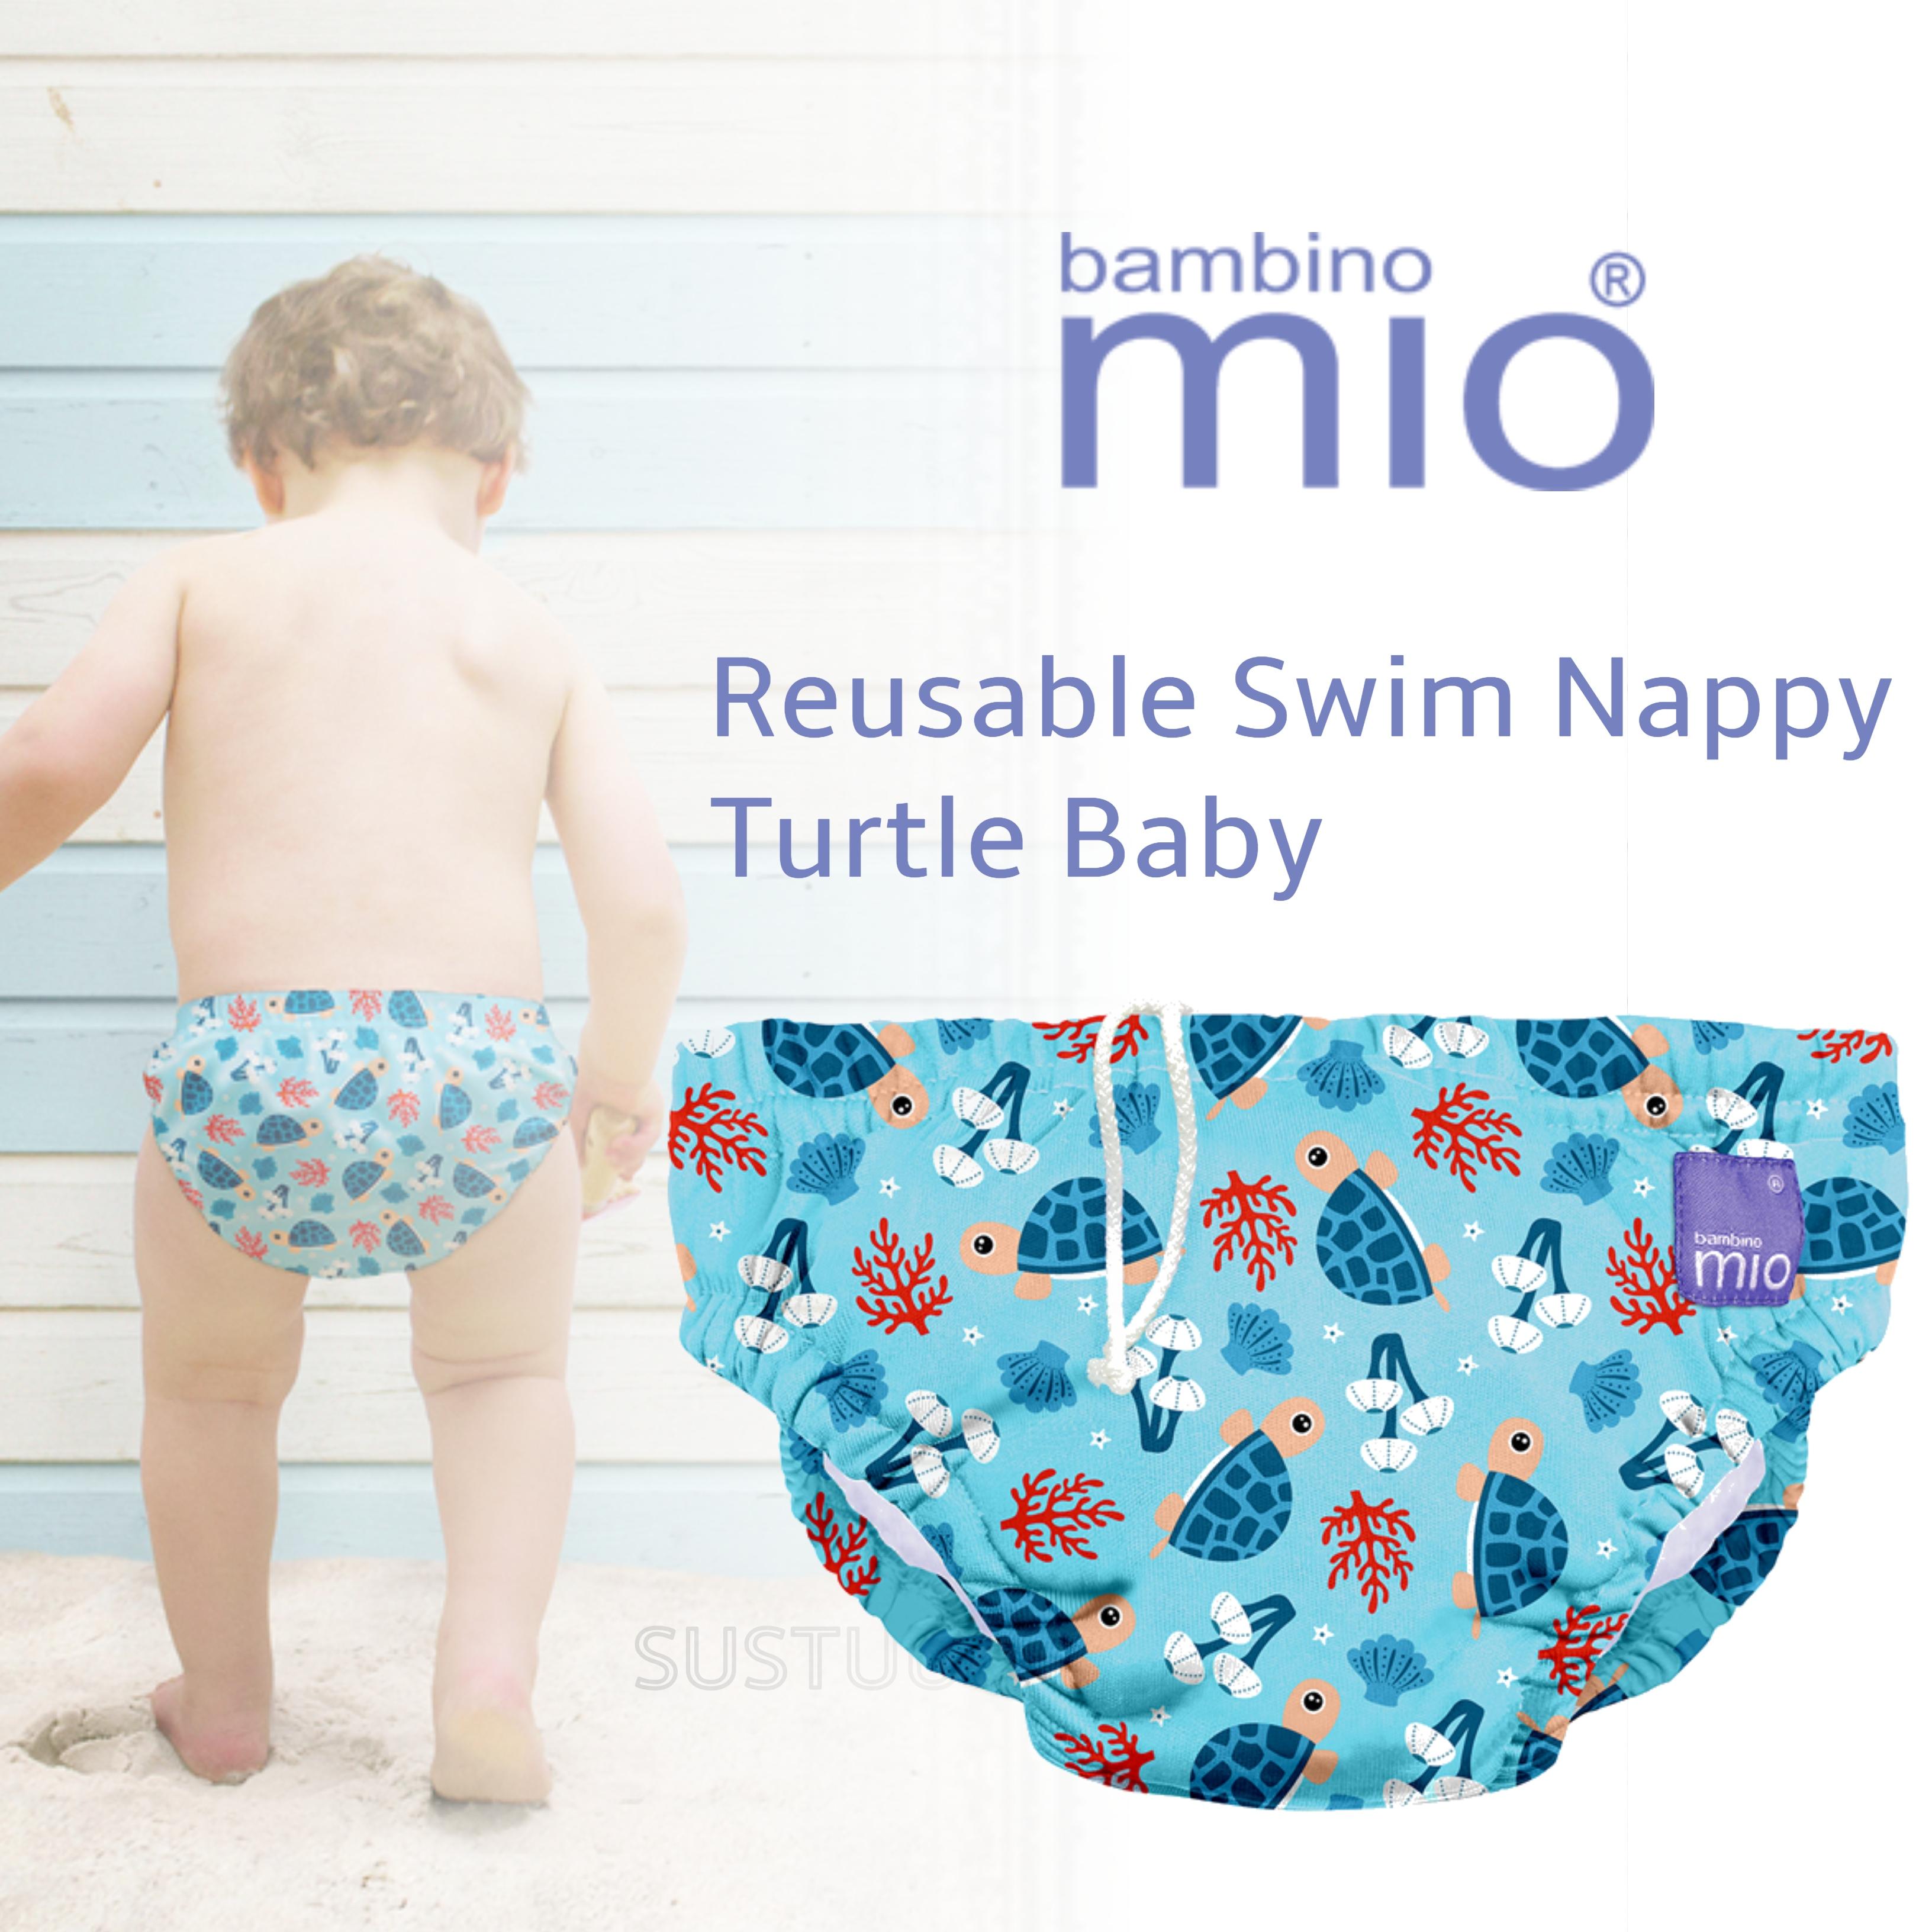 Bambino Mio Reusable Swim Nappy Turtle Baby|Water Resist Layer|Soft Cotton|6-12m